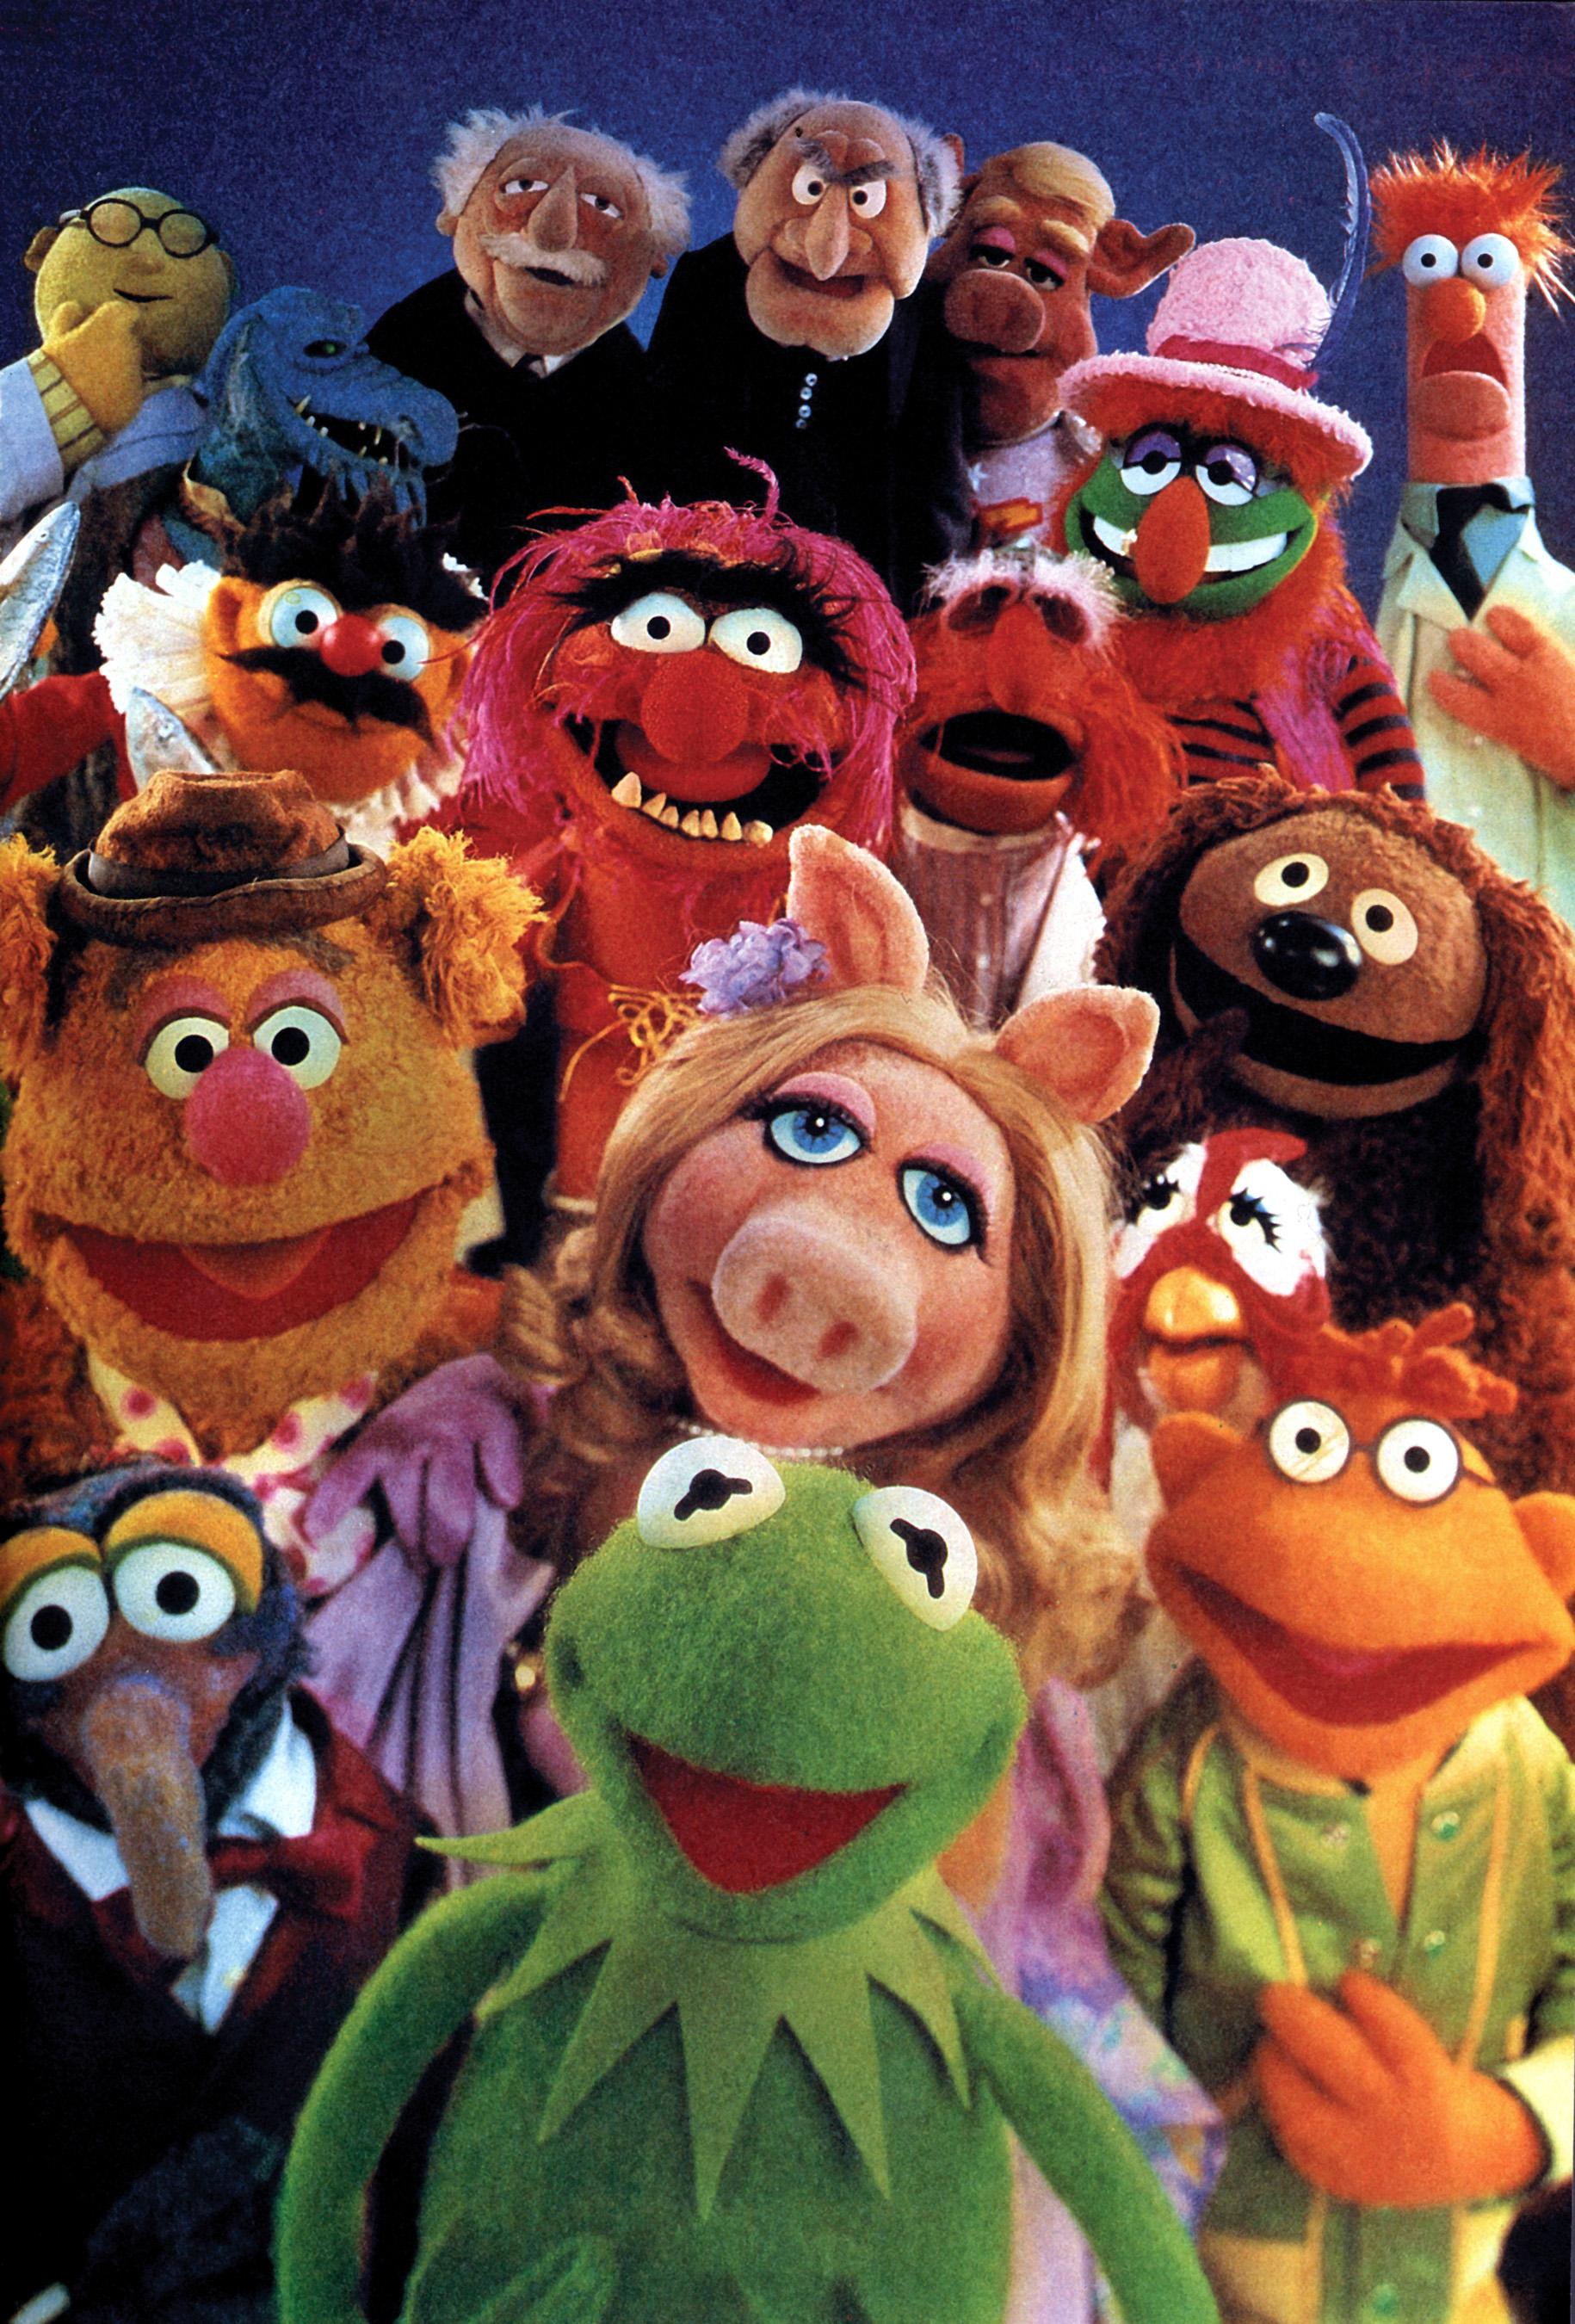 Animal The Muppets FUN Kermit Miss Piggy Beaker Fozzie Bear Gonzo